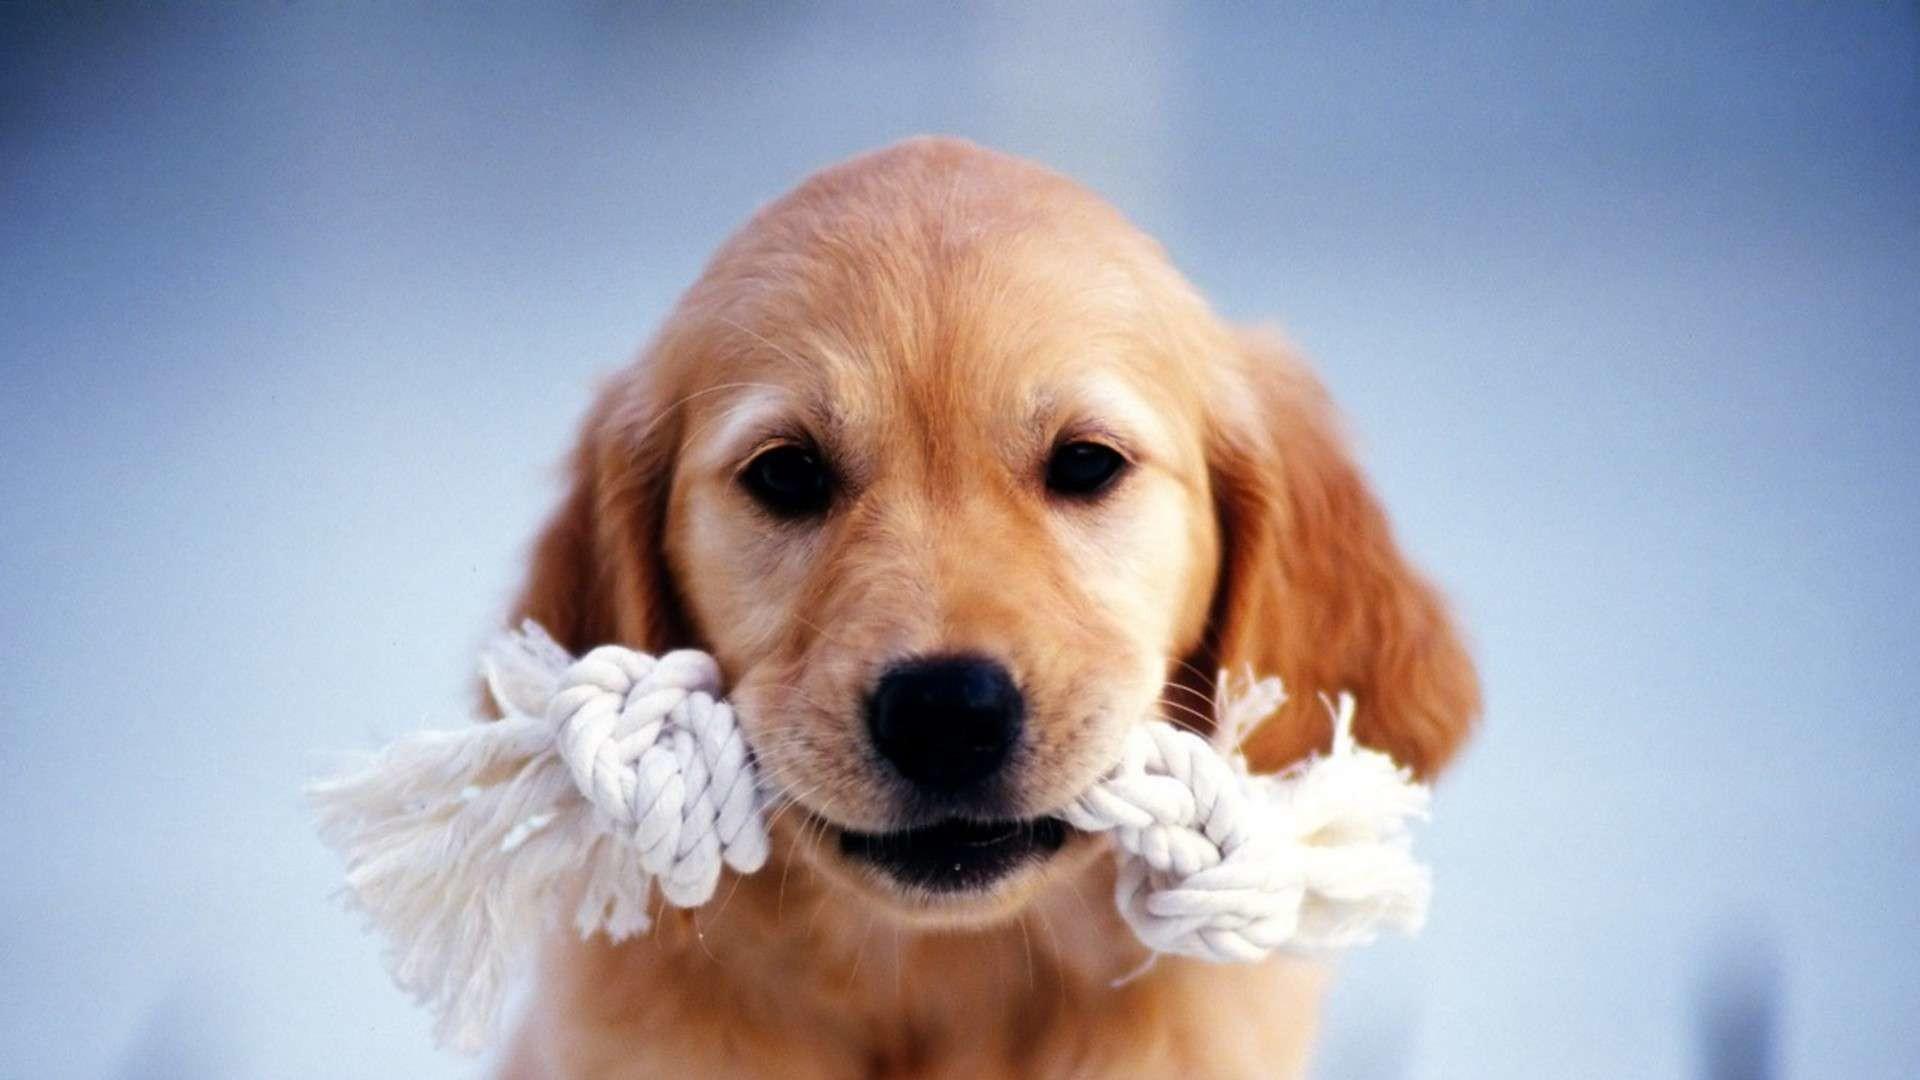 Cute HD Dachshund Puppies Wallpaper   HDWallWide.com